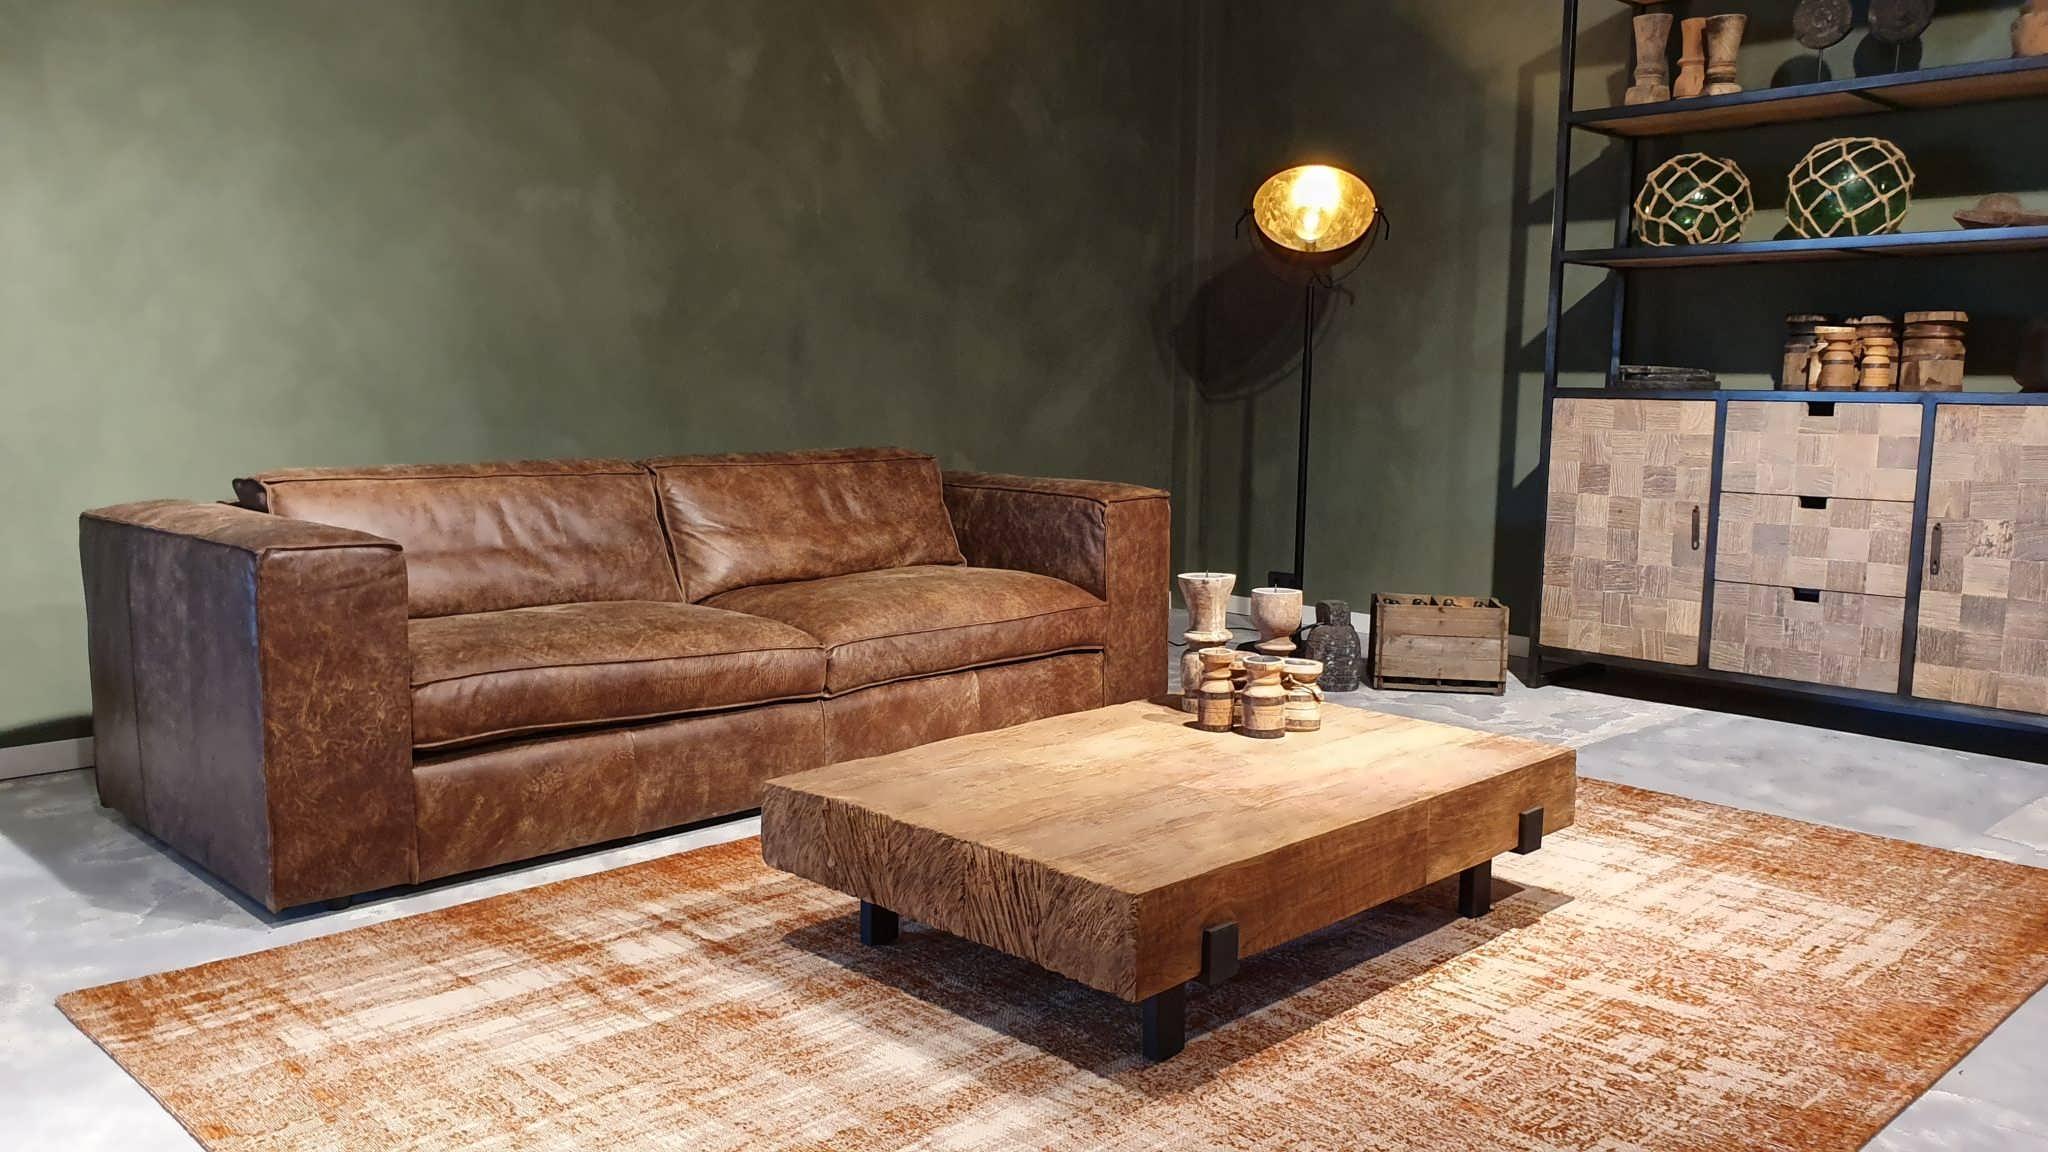 Hoekbank Leer Lounge.Palagano Bank Met Chaise Longue In Ruim 43 Kleuren Robuustetafels Nl